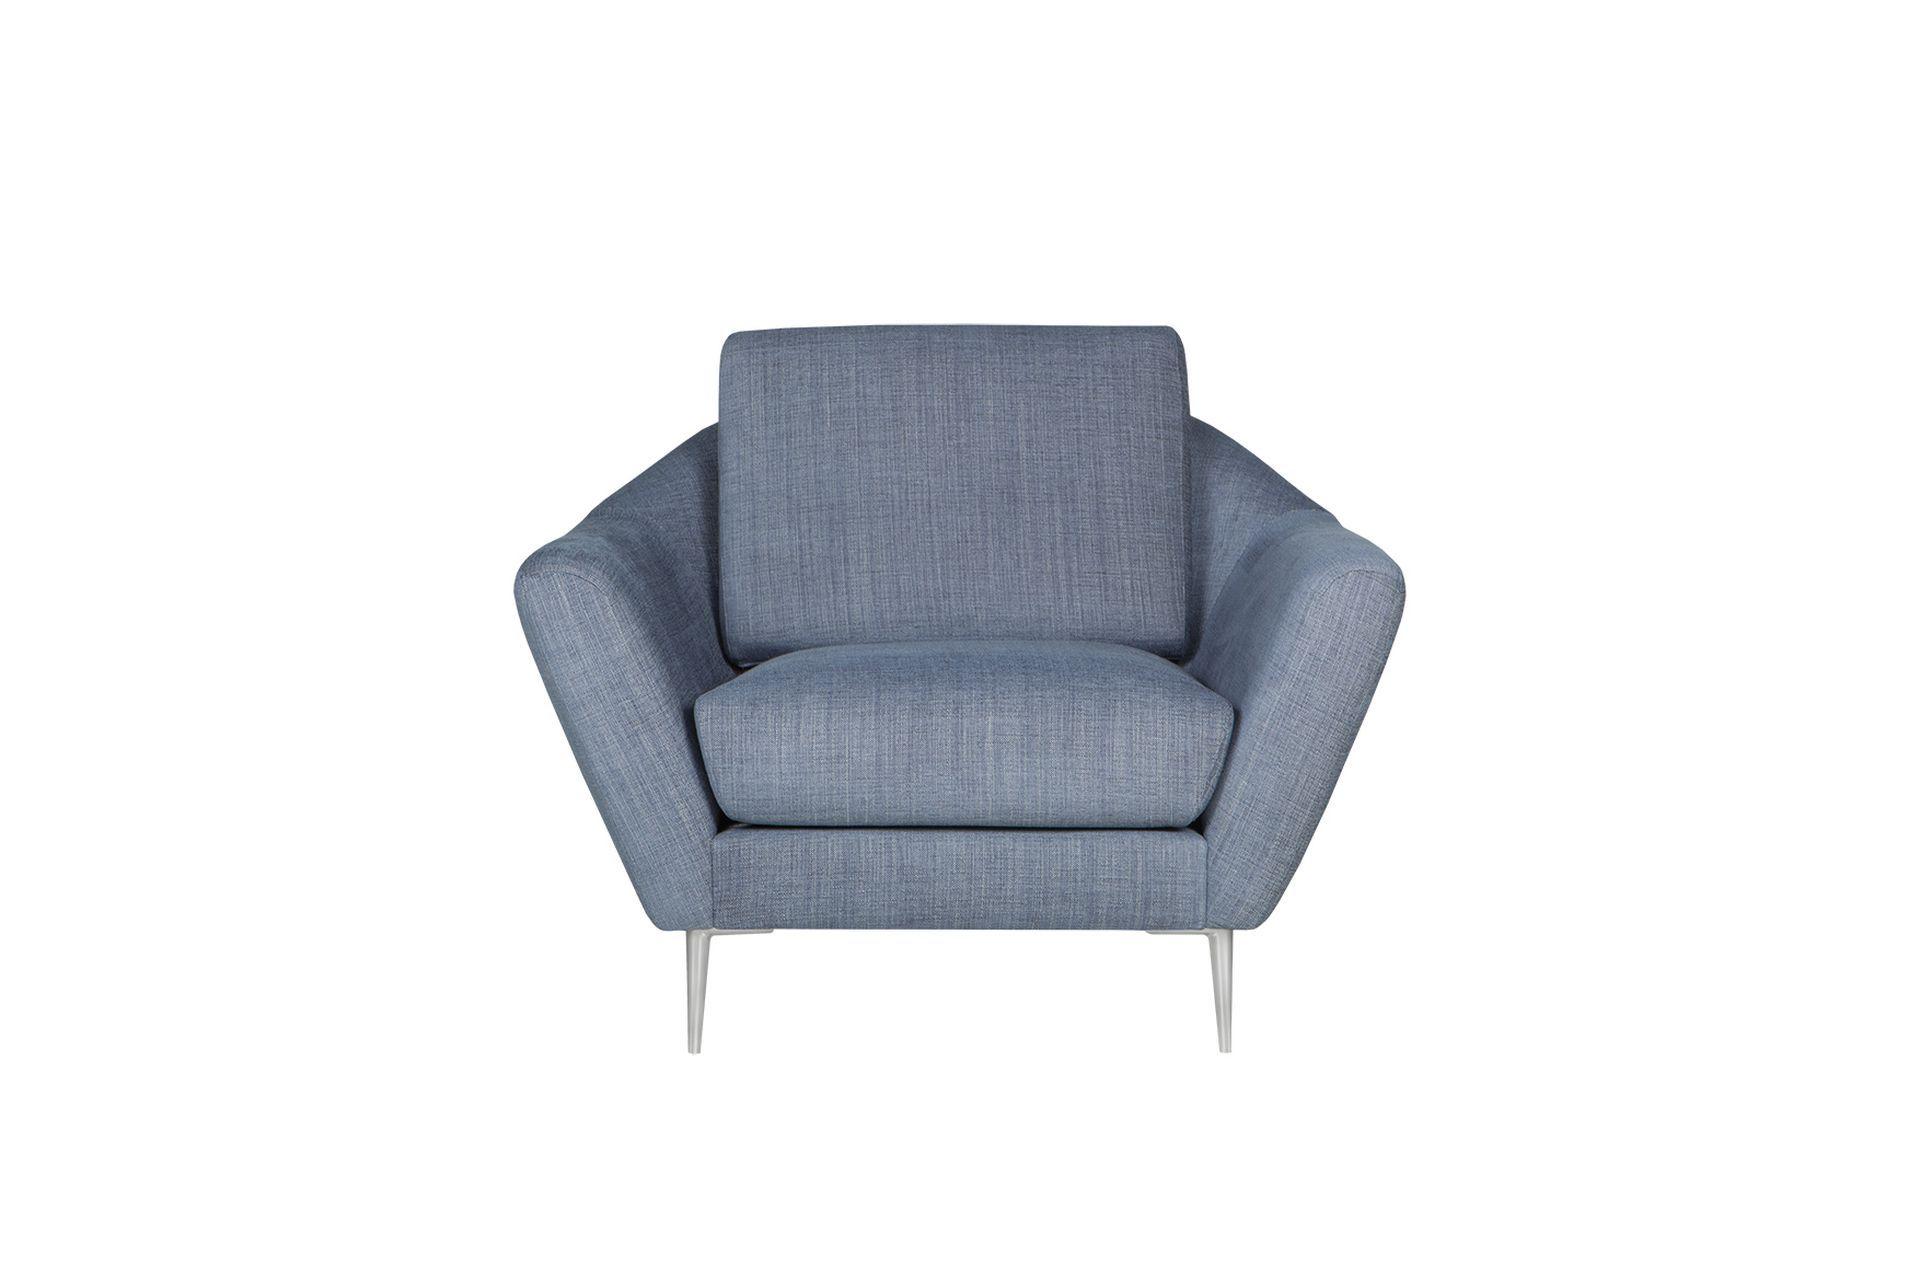 Кресло agda (sits) серый 104x84x94 см.